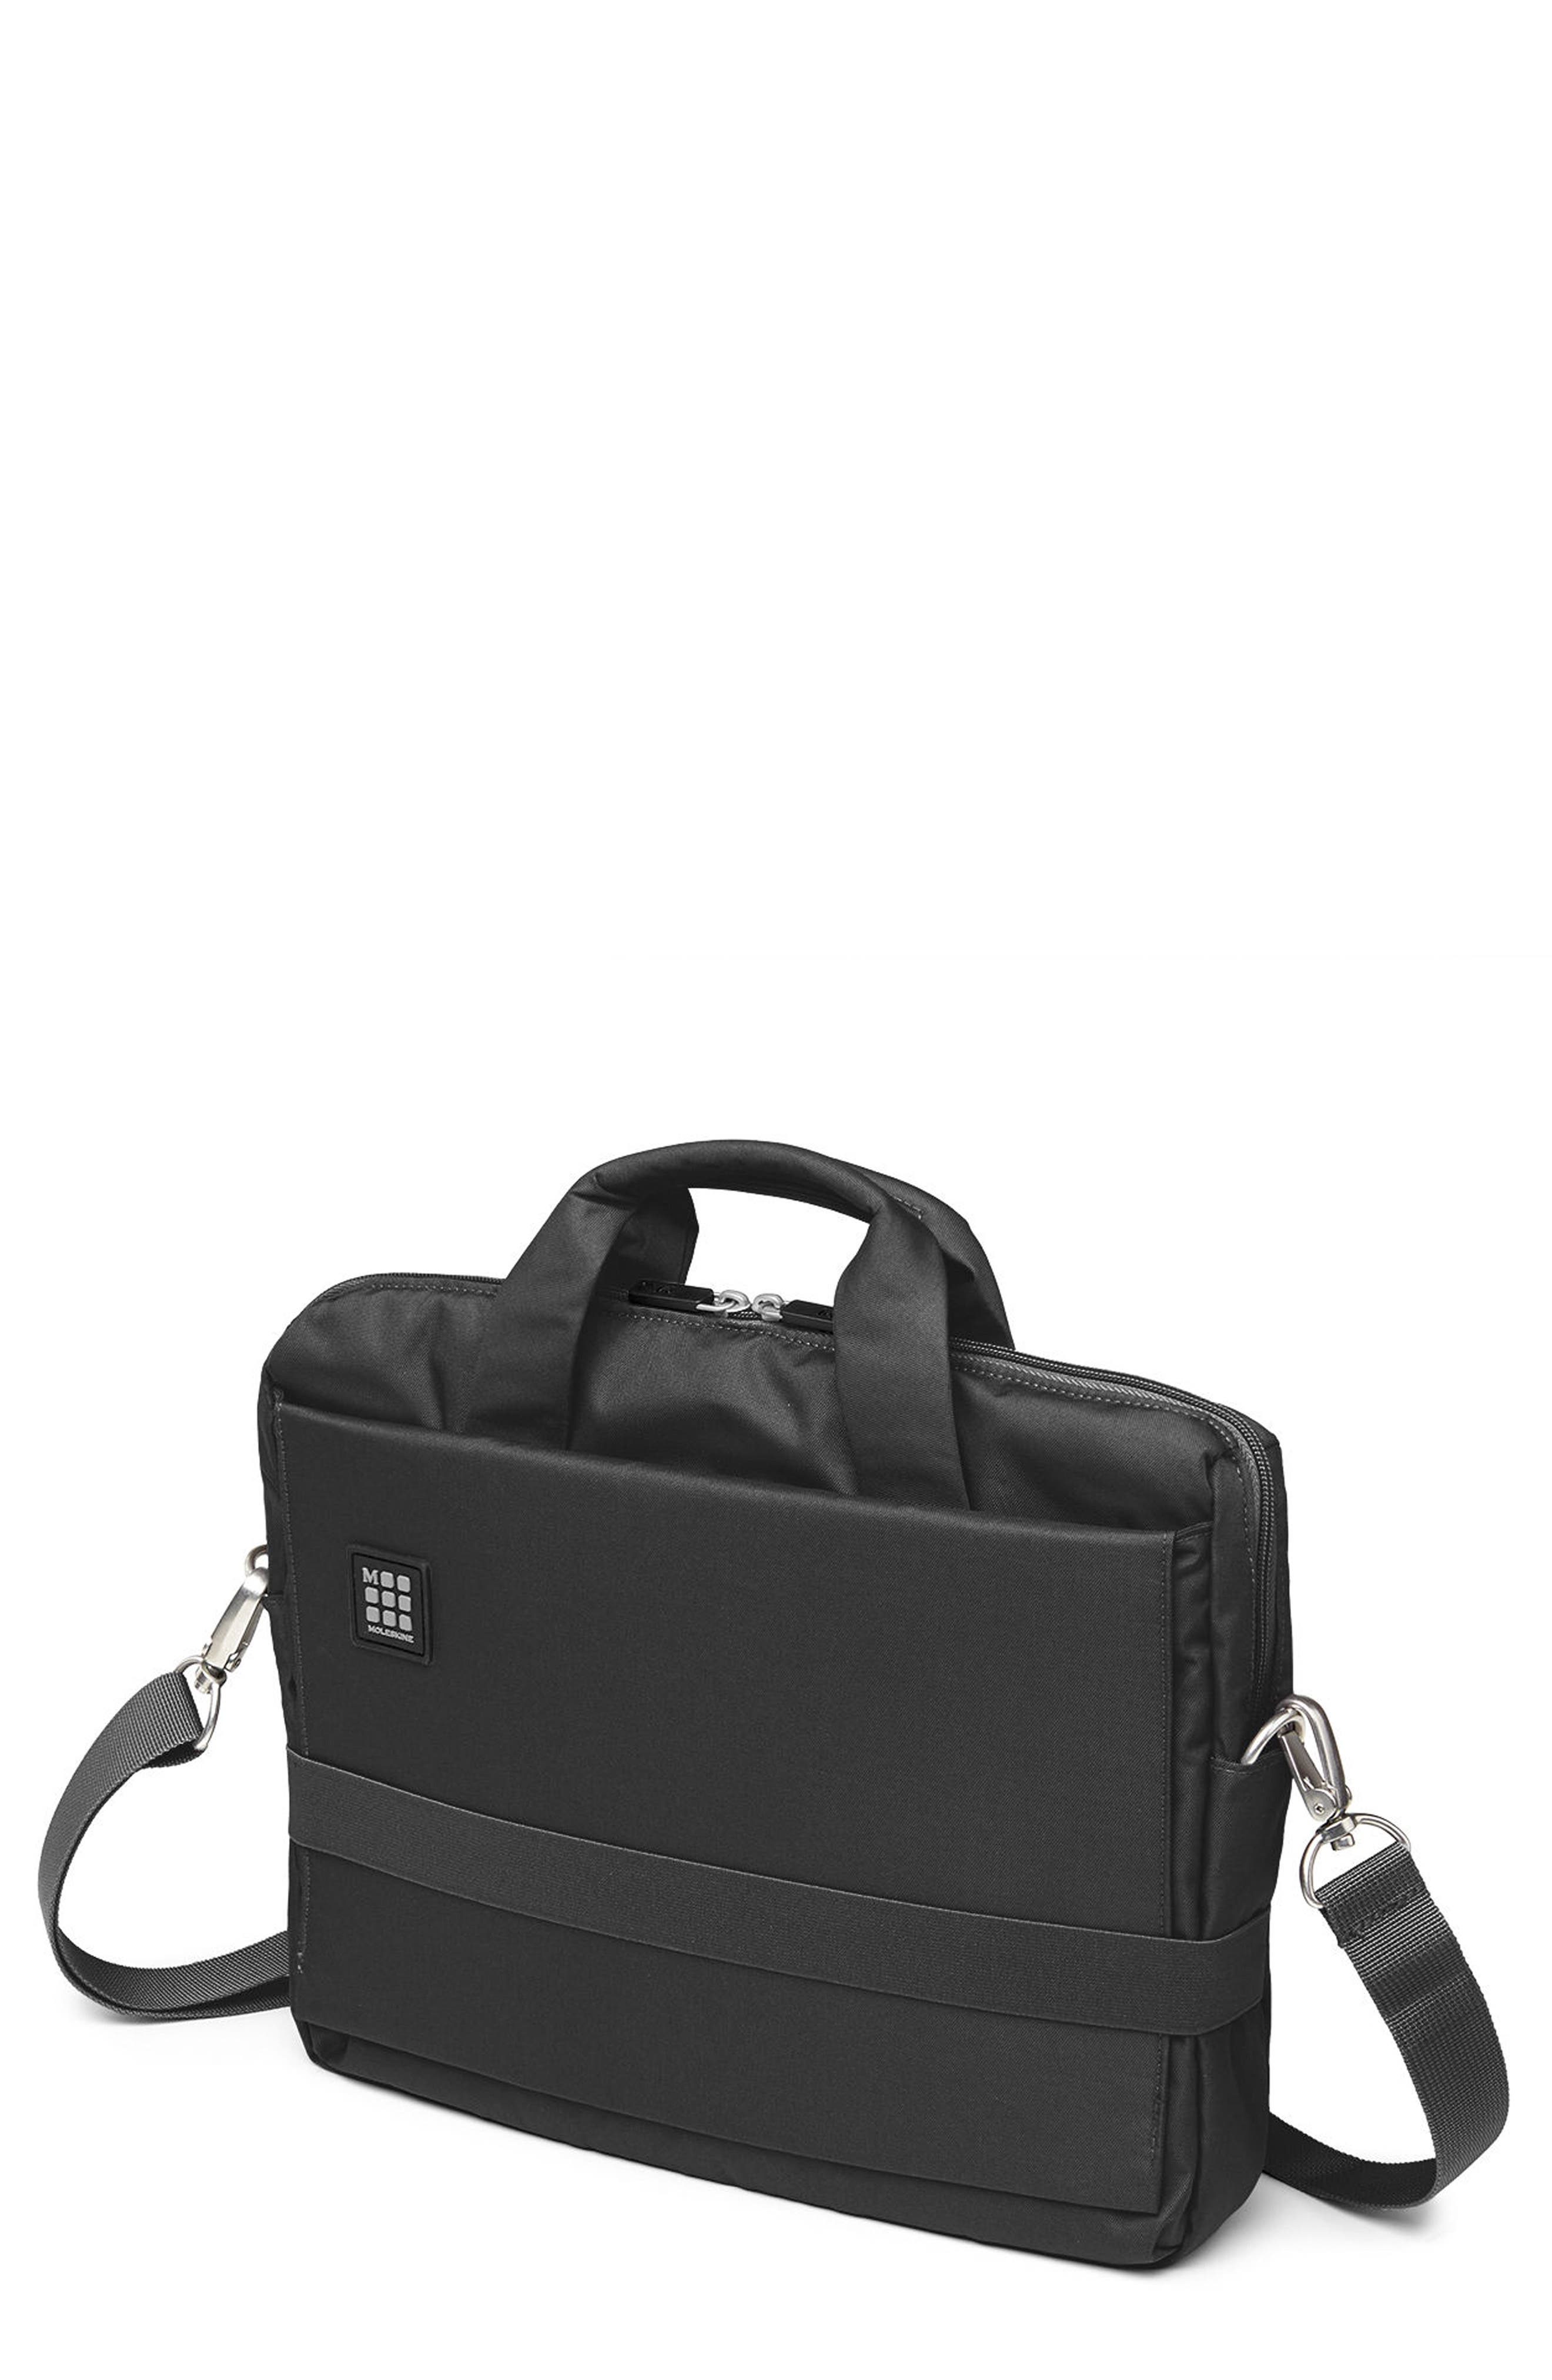 Horizontal Device Bag,                         Main,                         color, 001